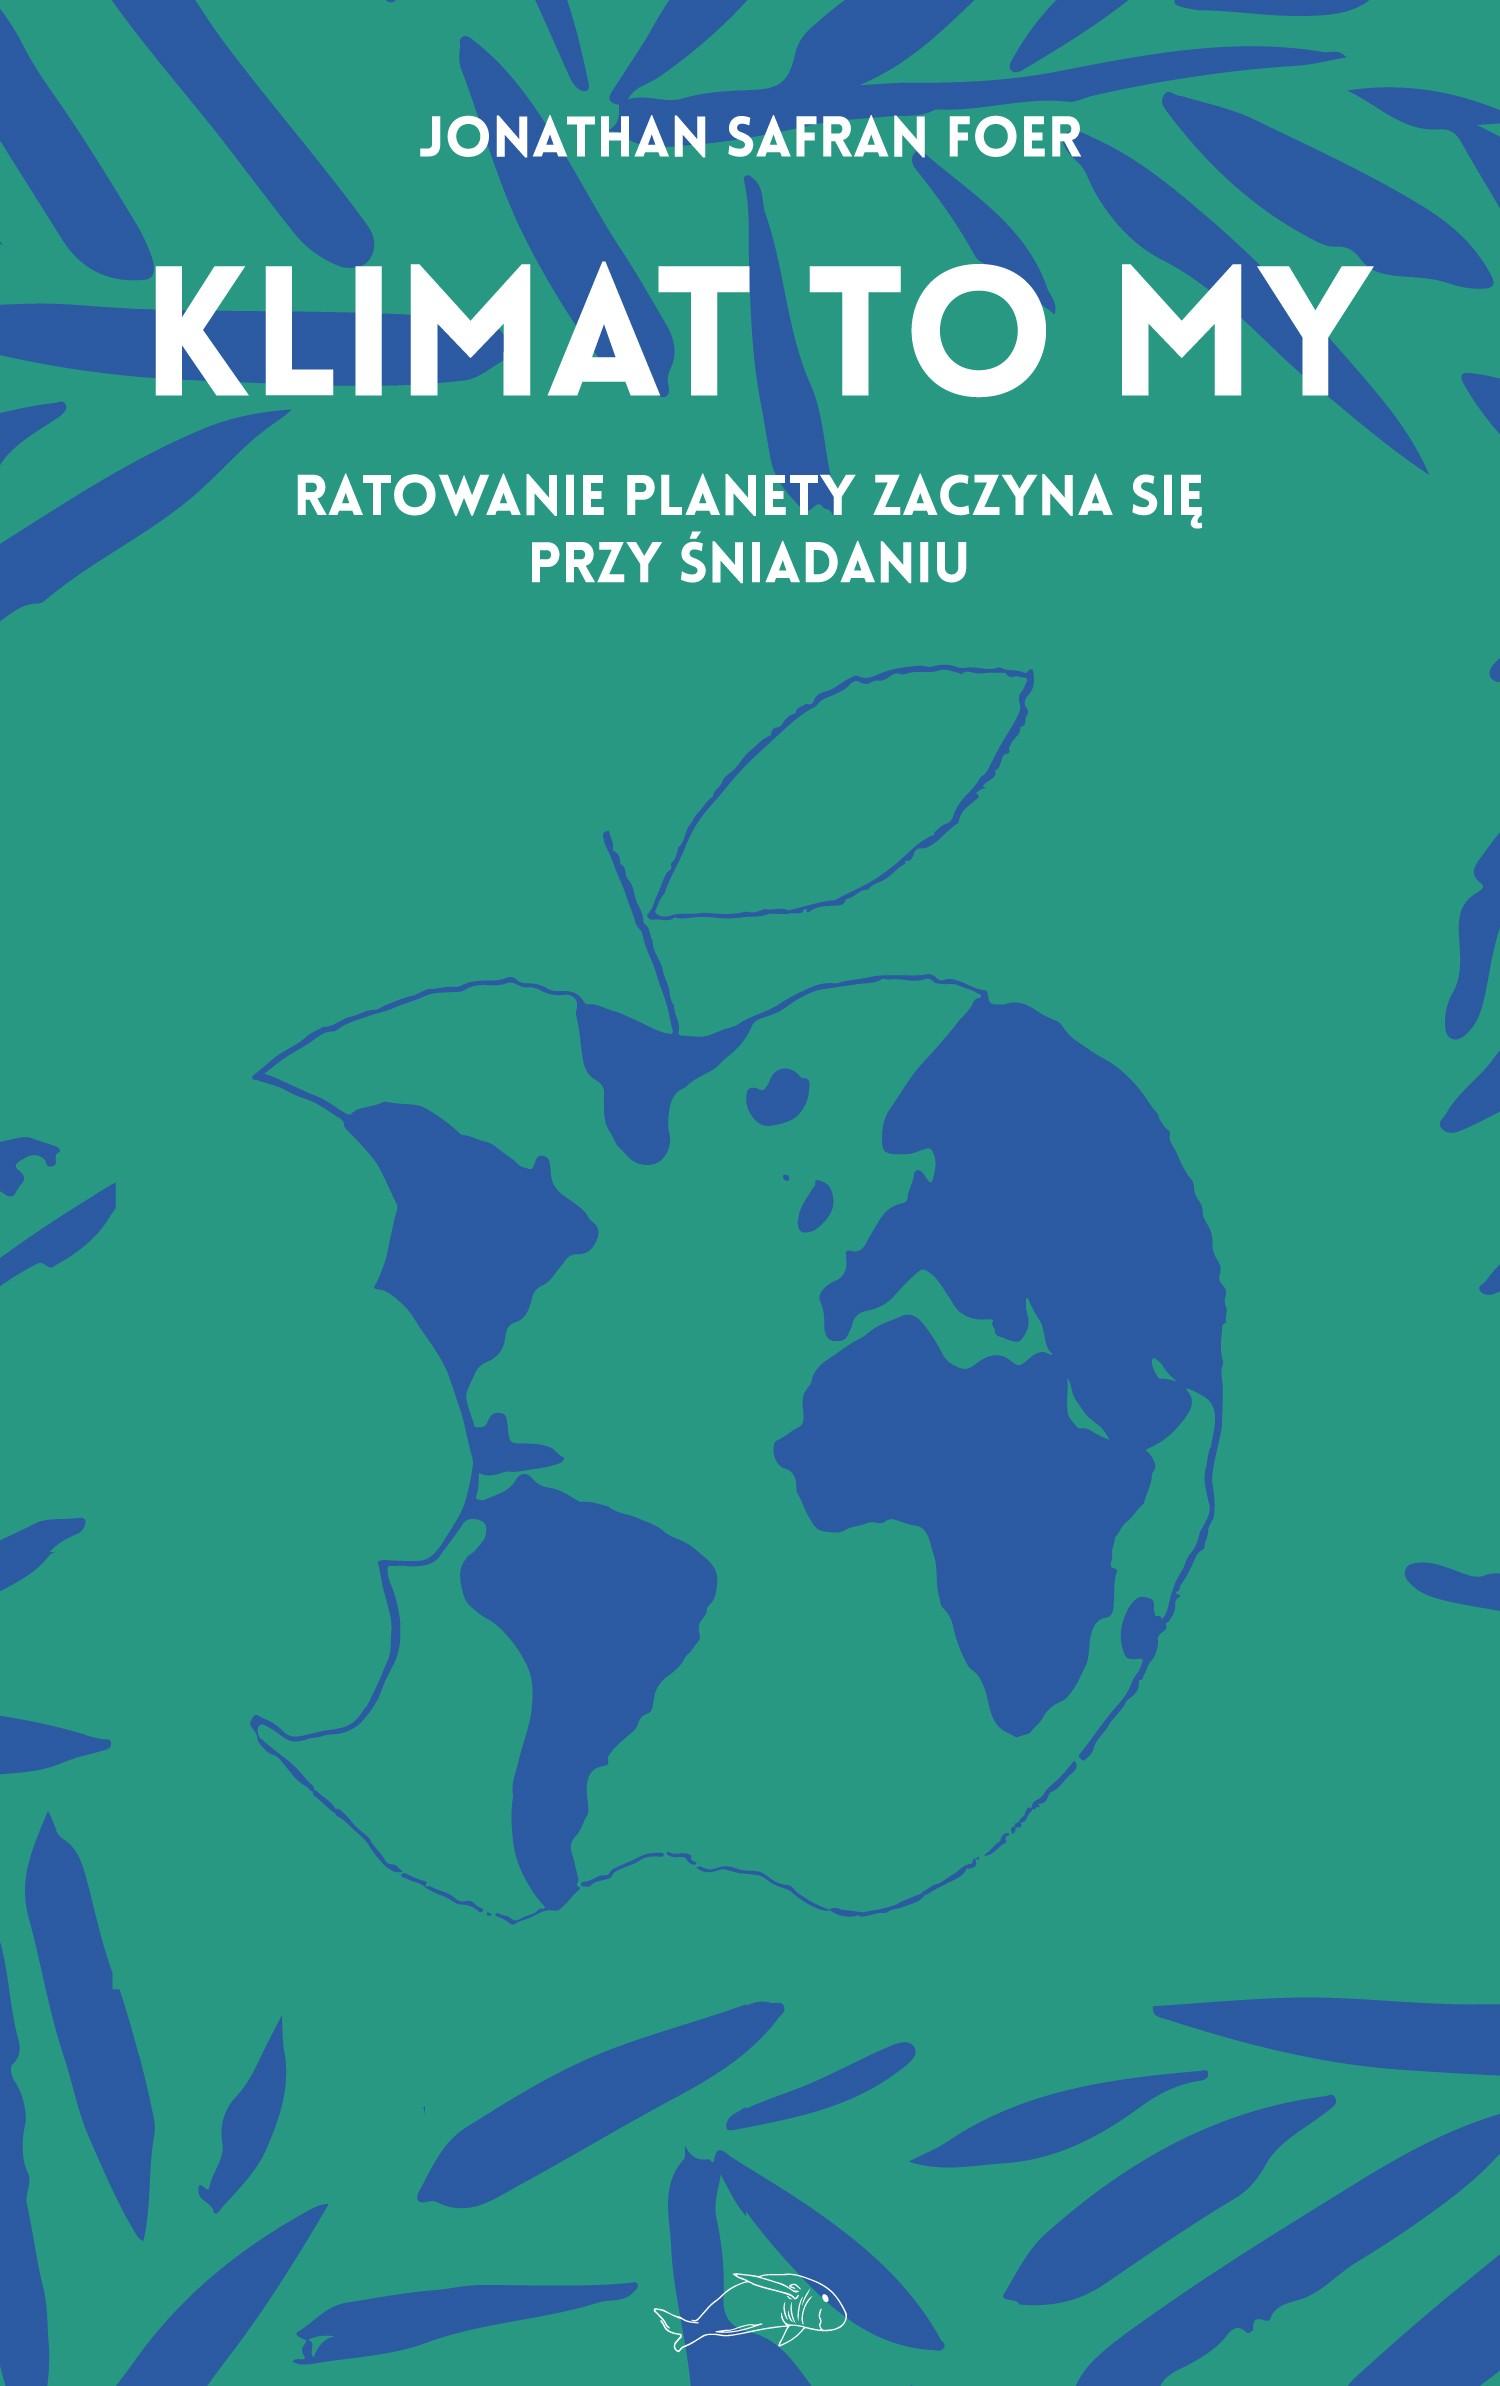 Jonathan Safran Foer: Klimat to my